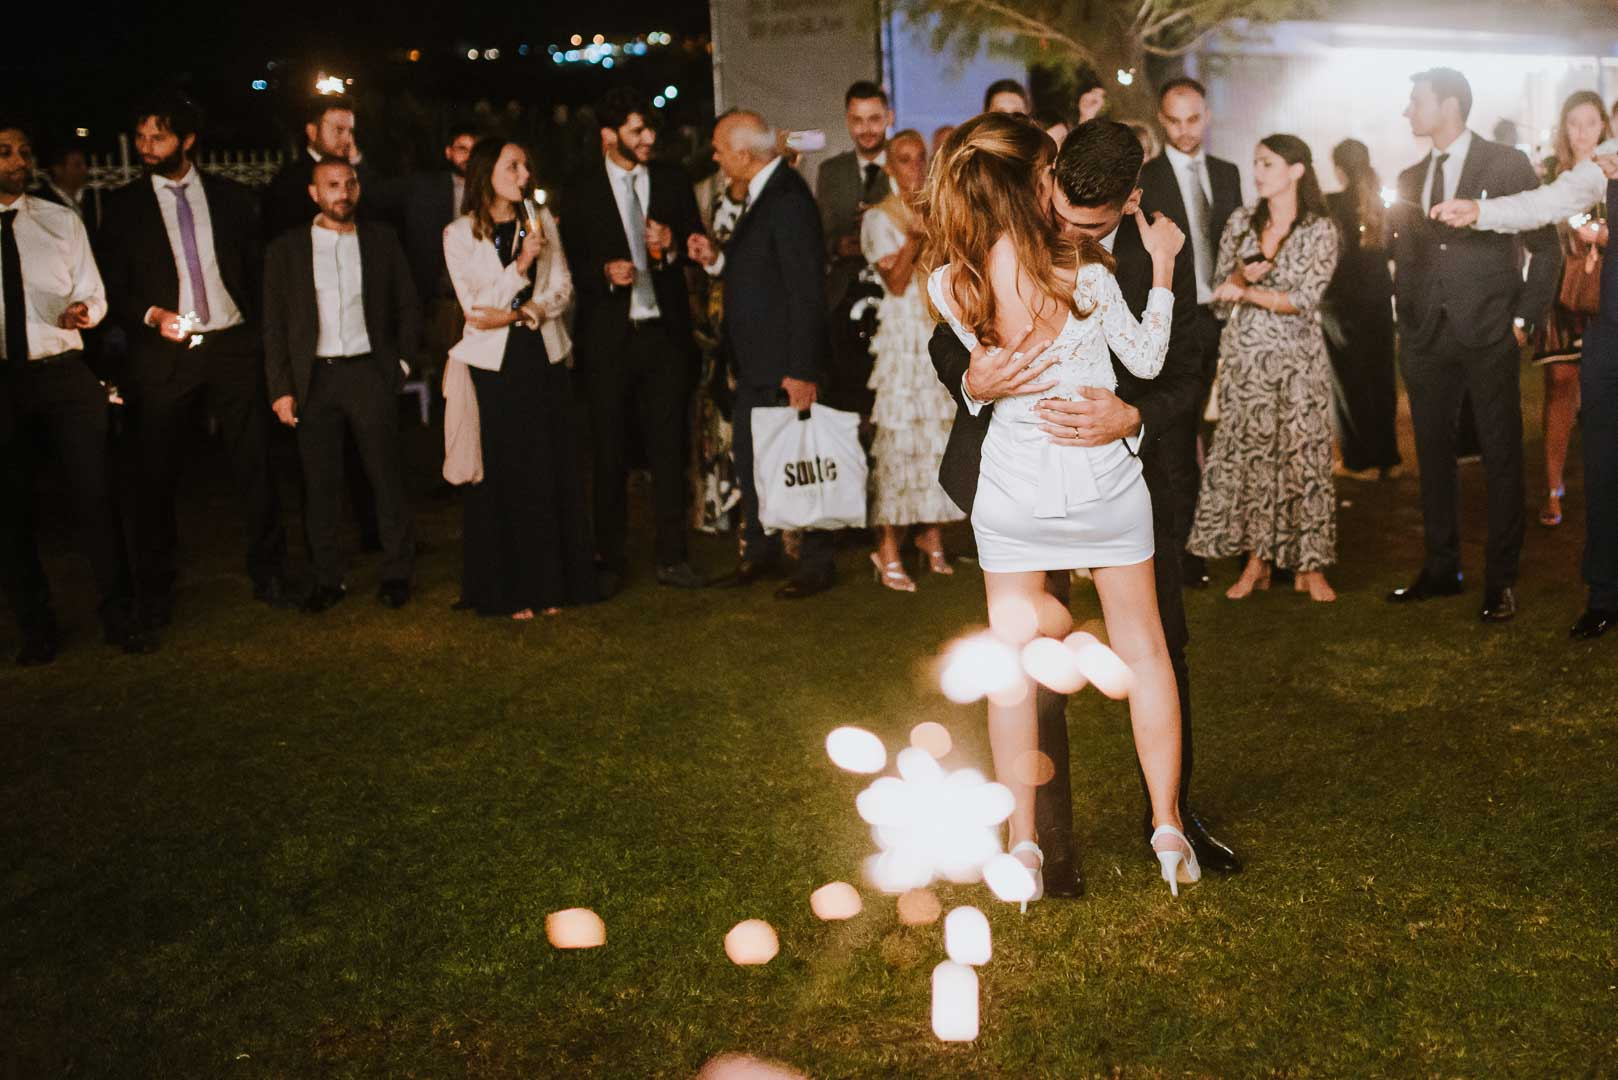 wedding-photographer-destination-fineart-bespoke-reportage-napoli-nabilah-vivianeizzo-spazio46-201